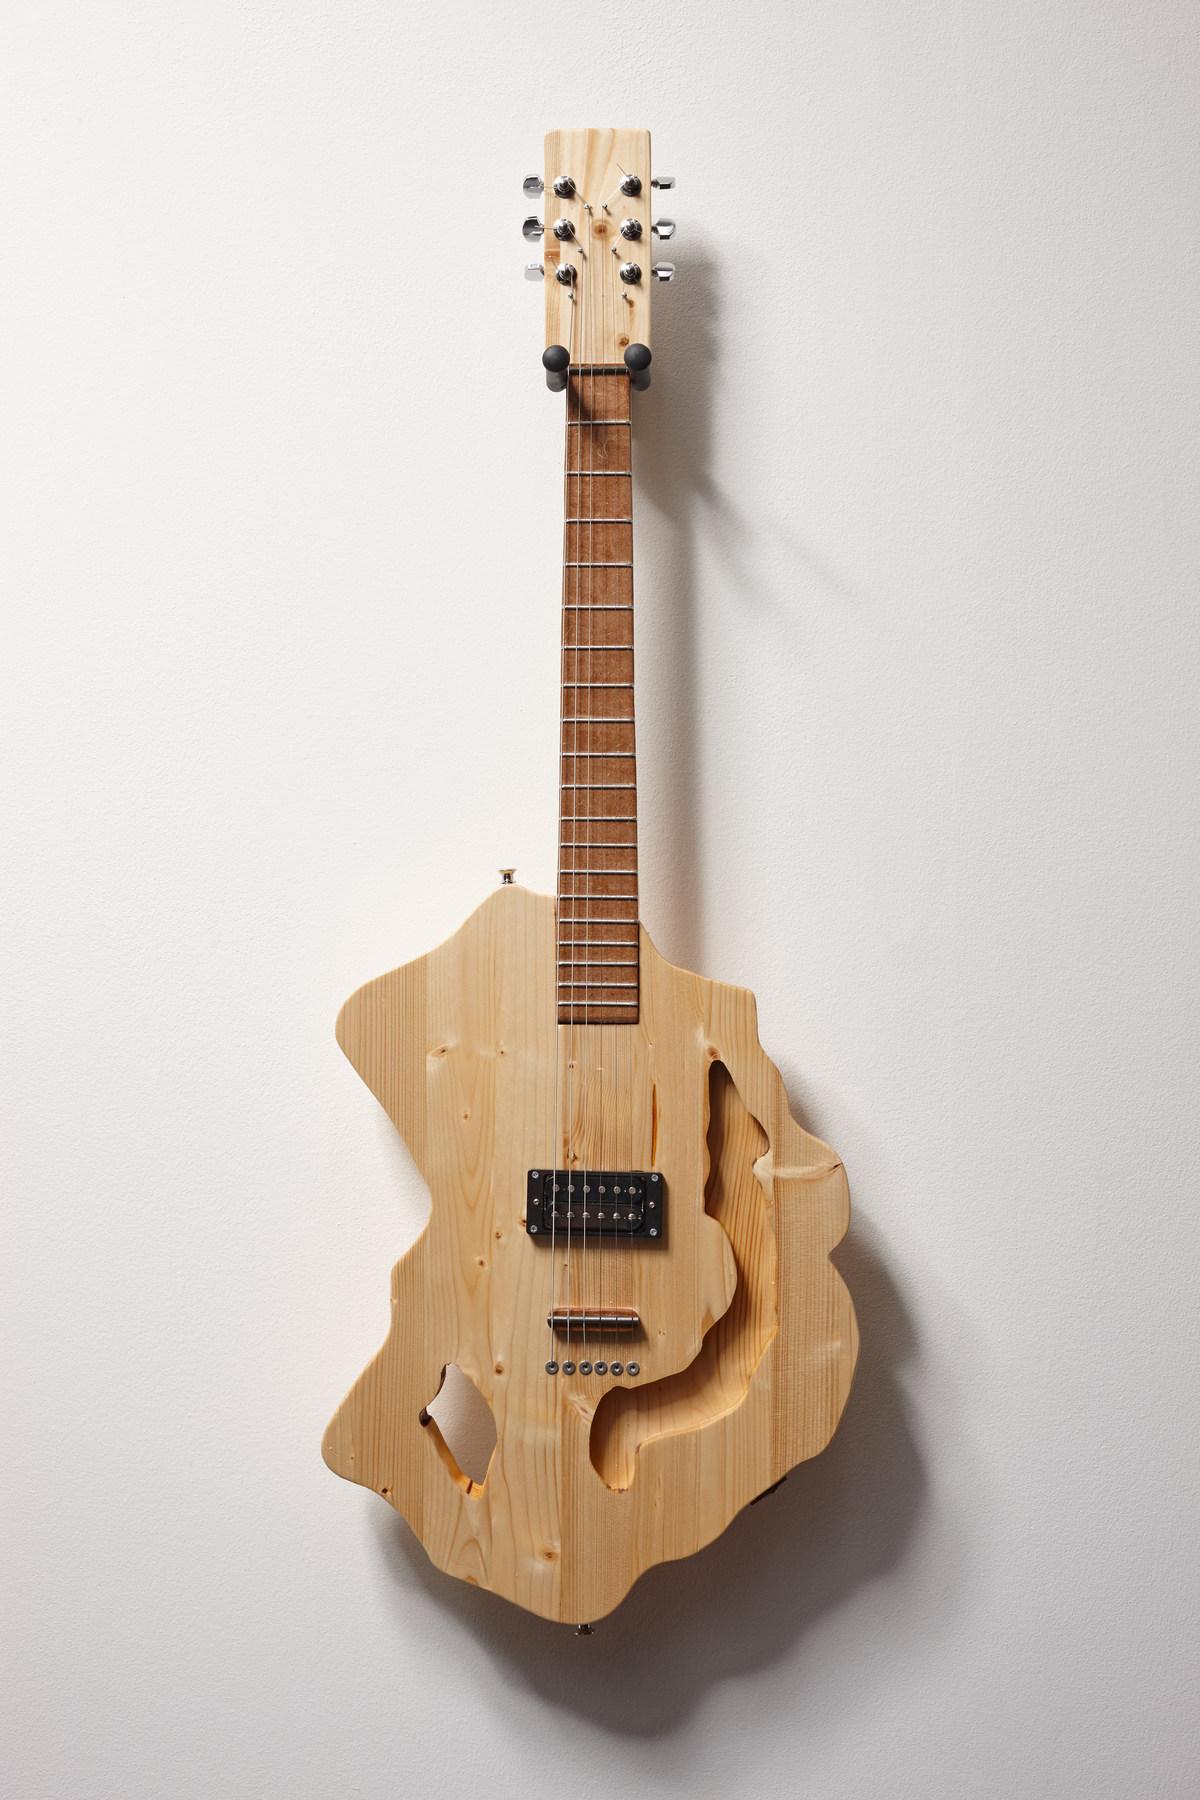 Flavio Merlo - Guitar IV, 2015